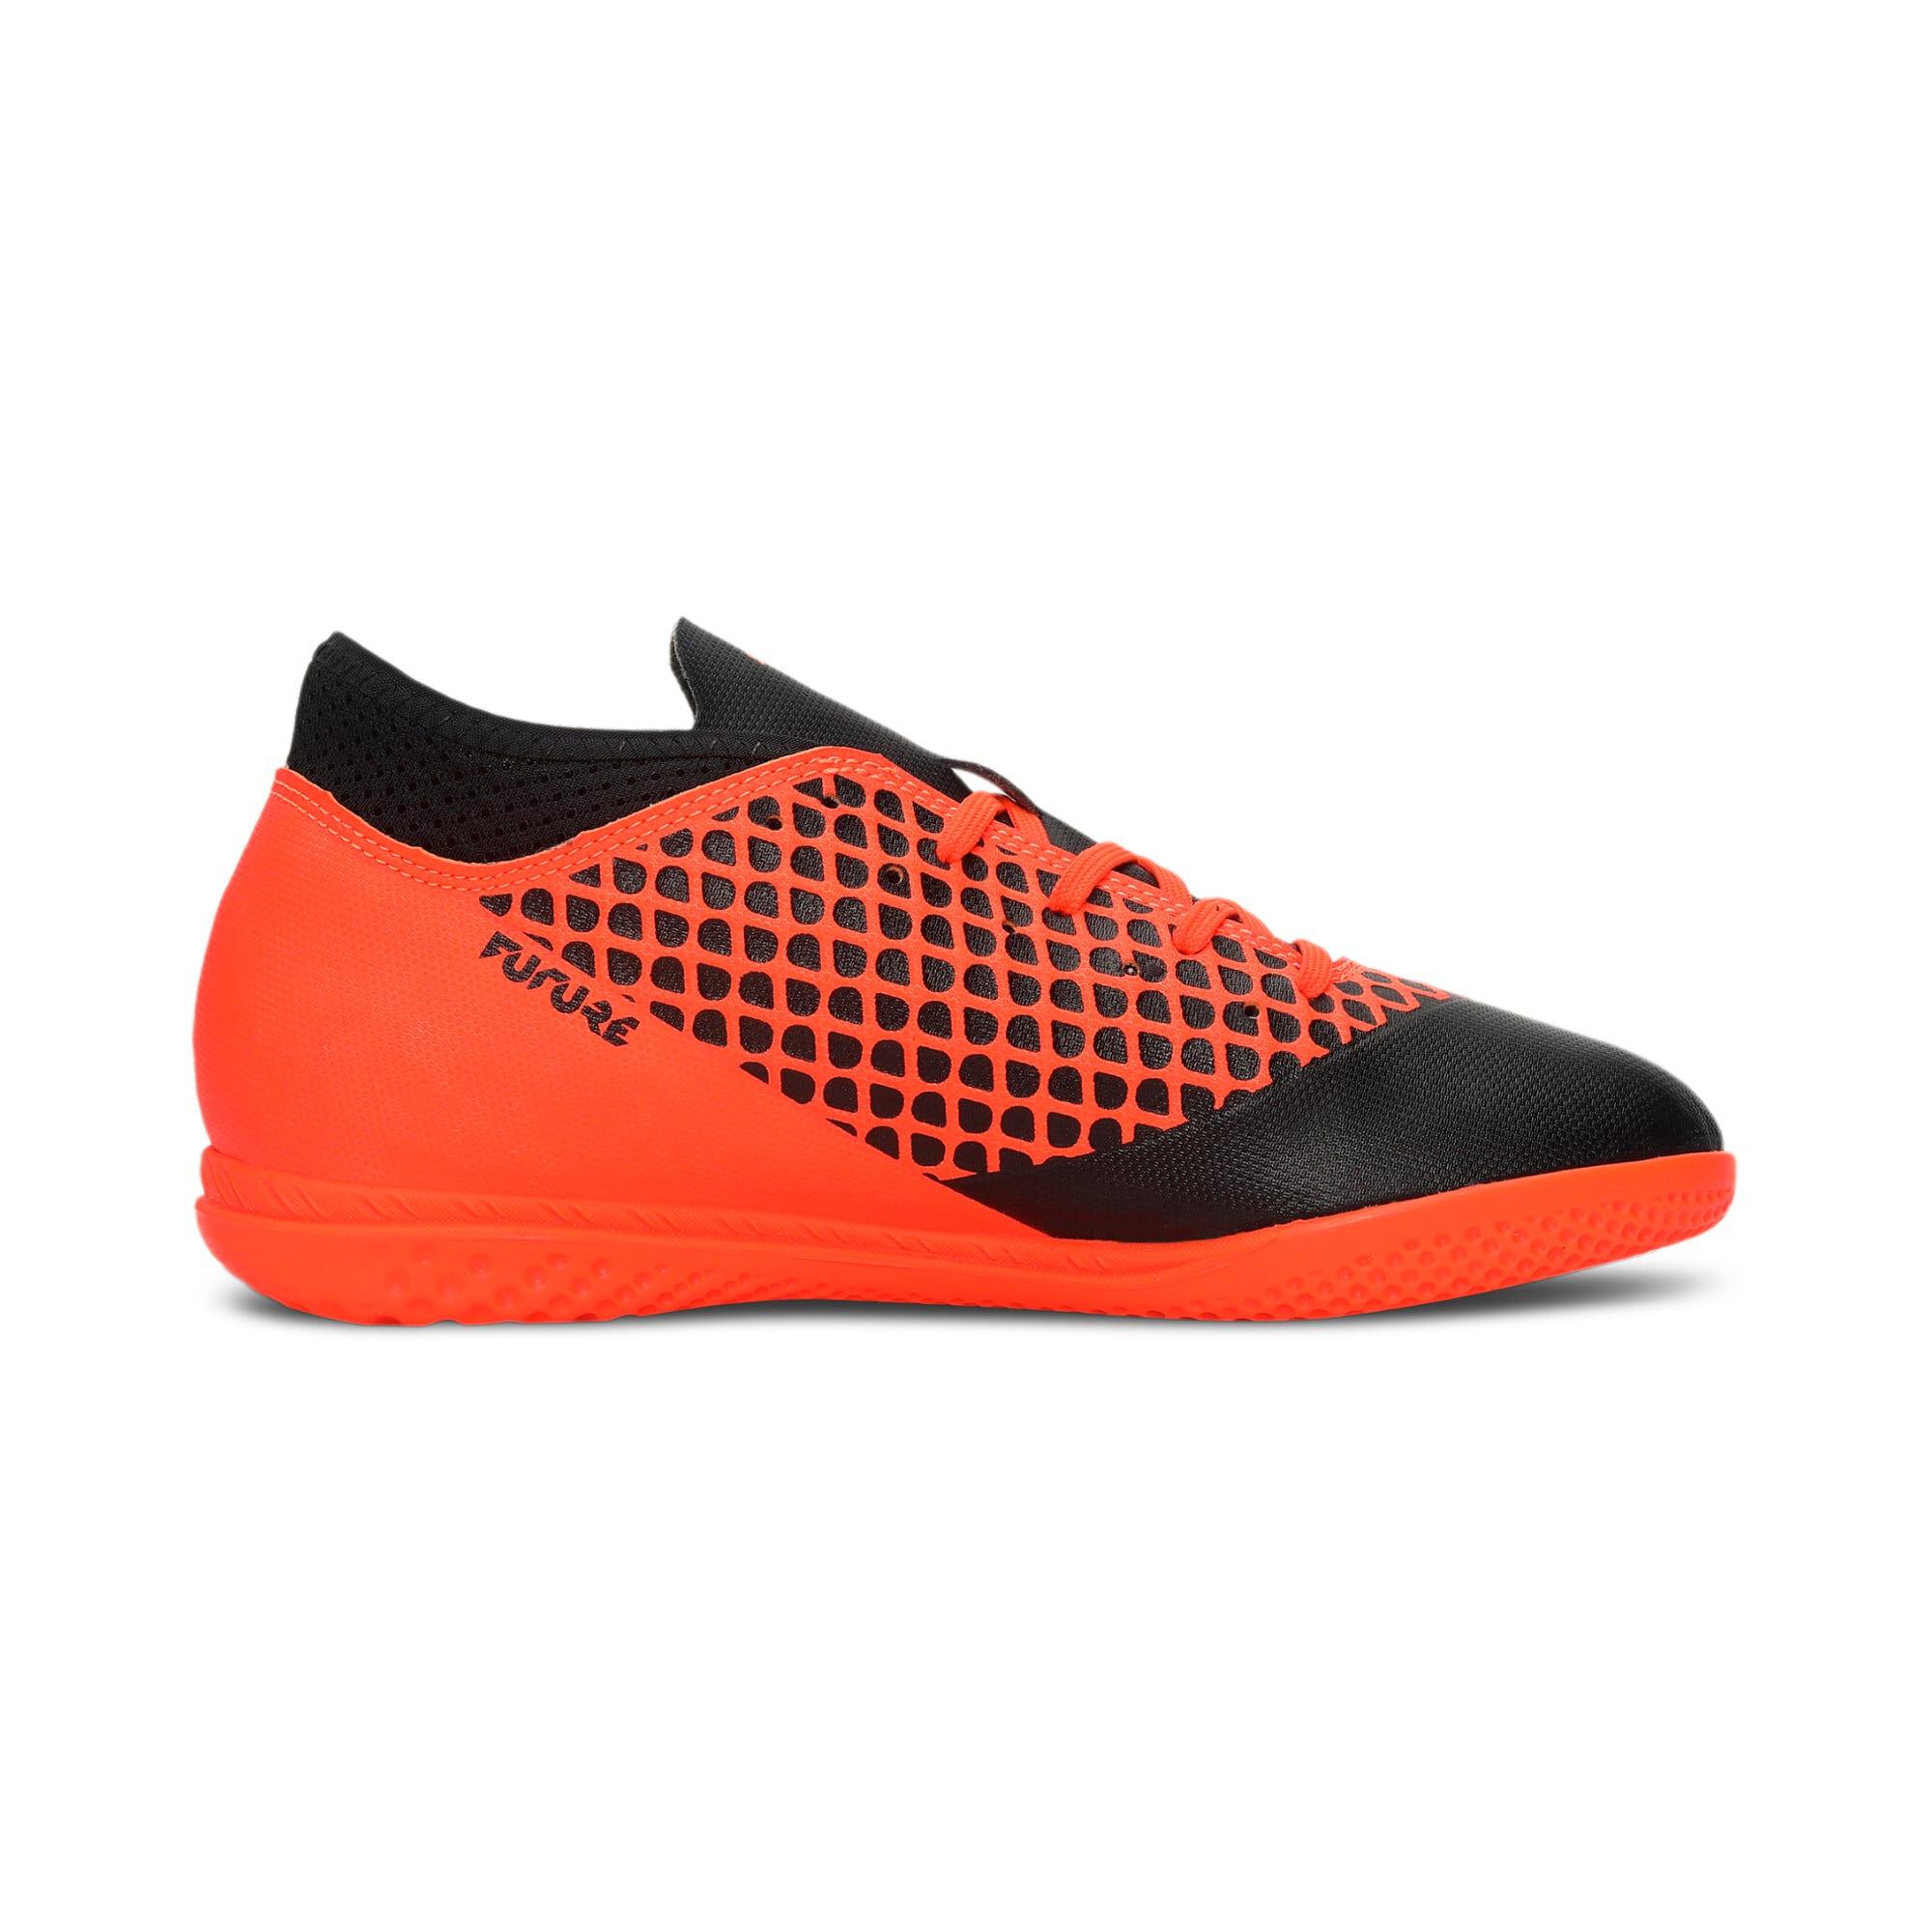 Thumbnail 5 of FUTURE 2.4 IT Kids' Football Shoes, Black-Orange, medium-IND